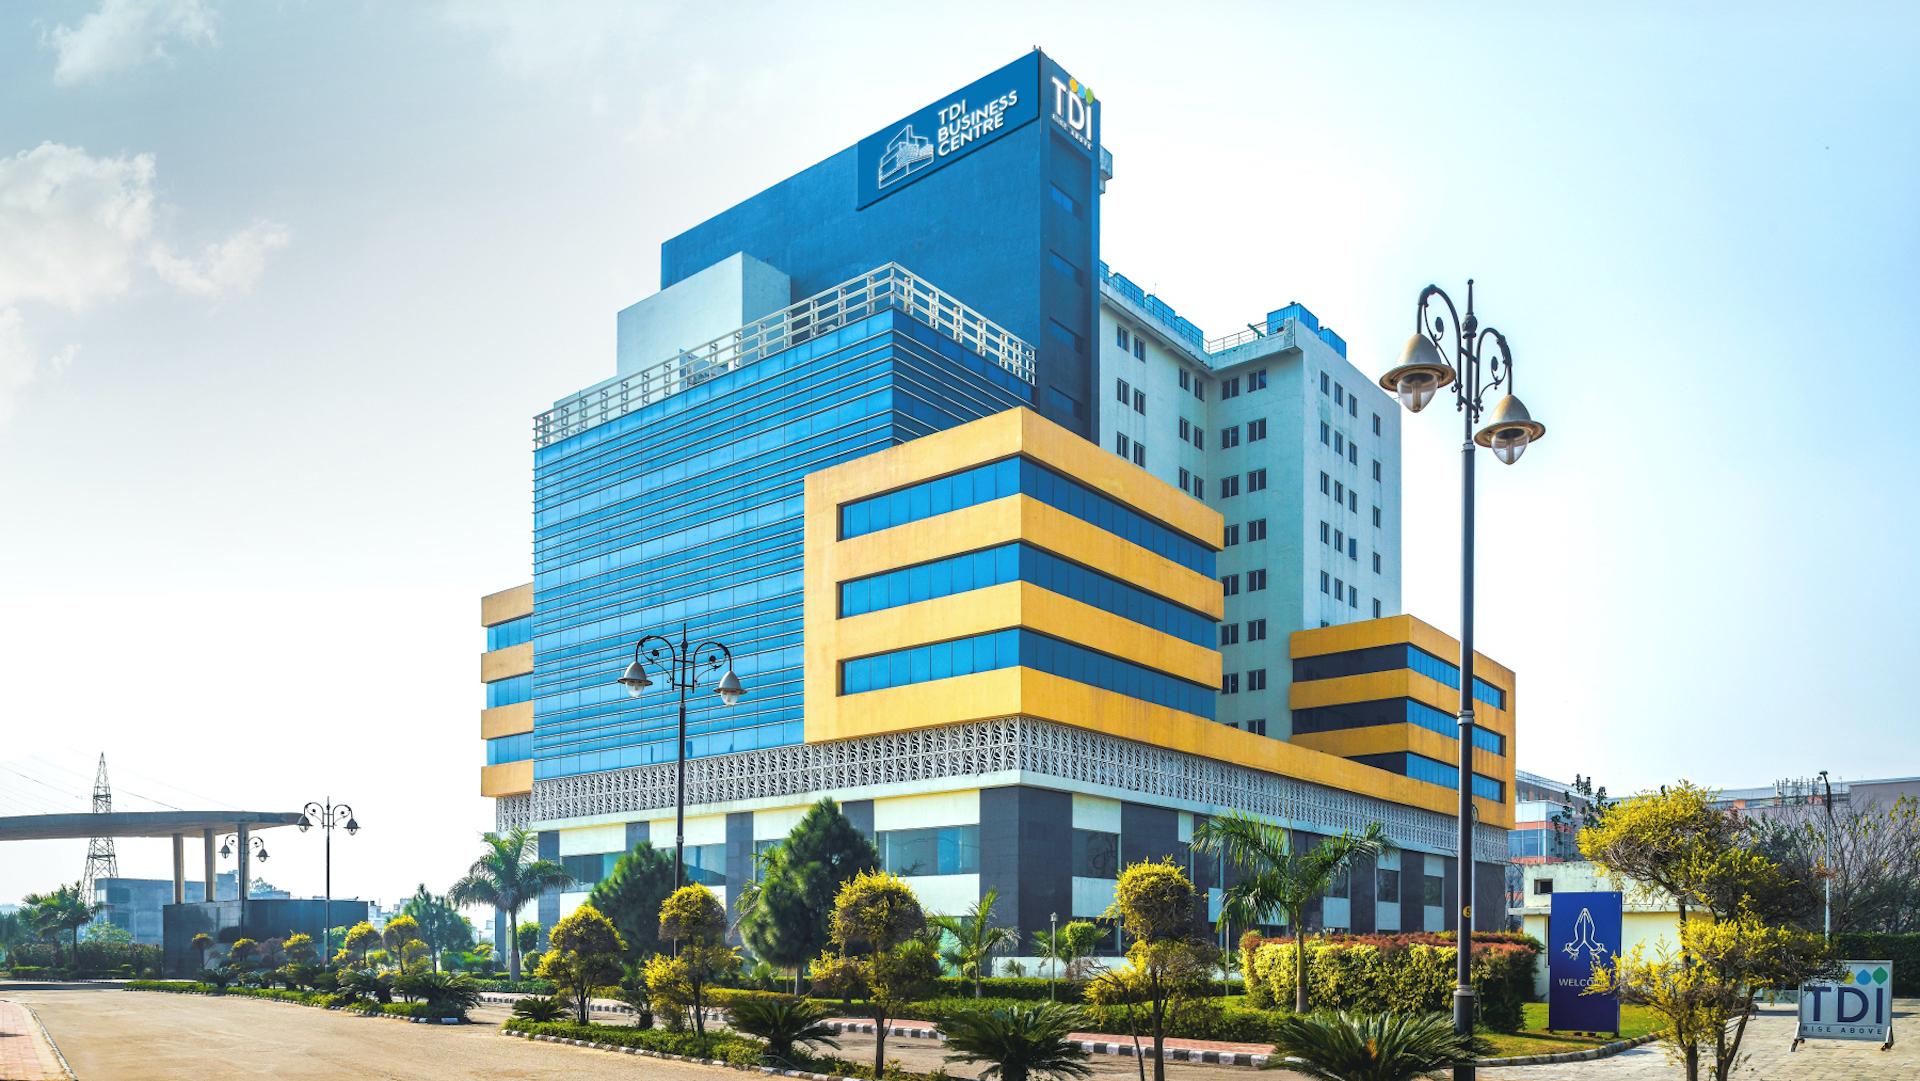 TDI Business Centre